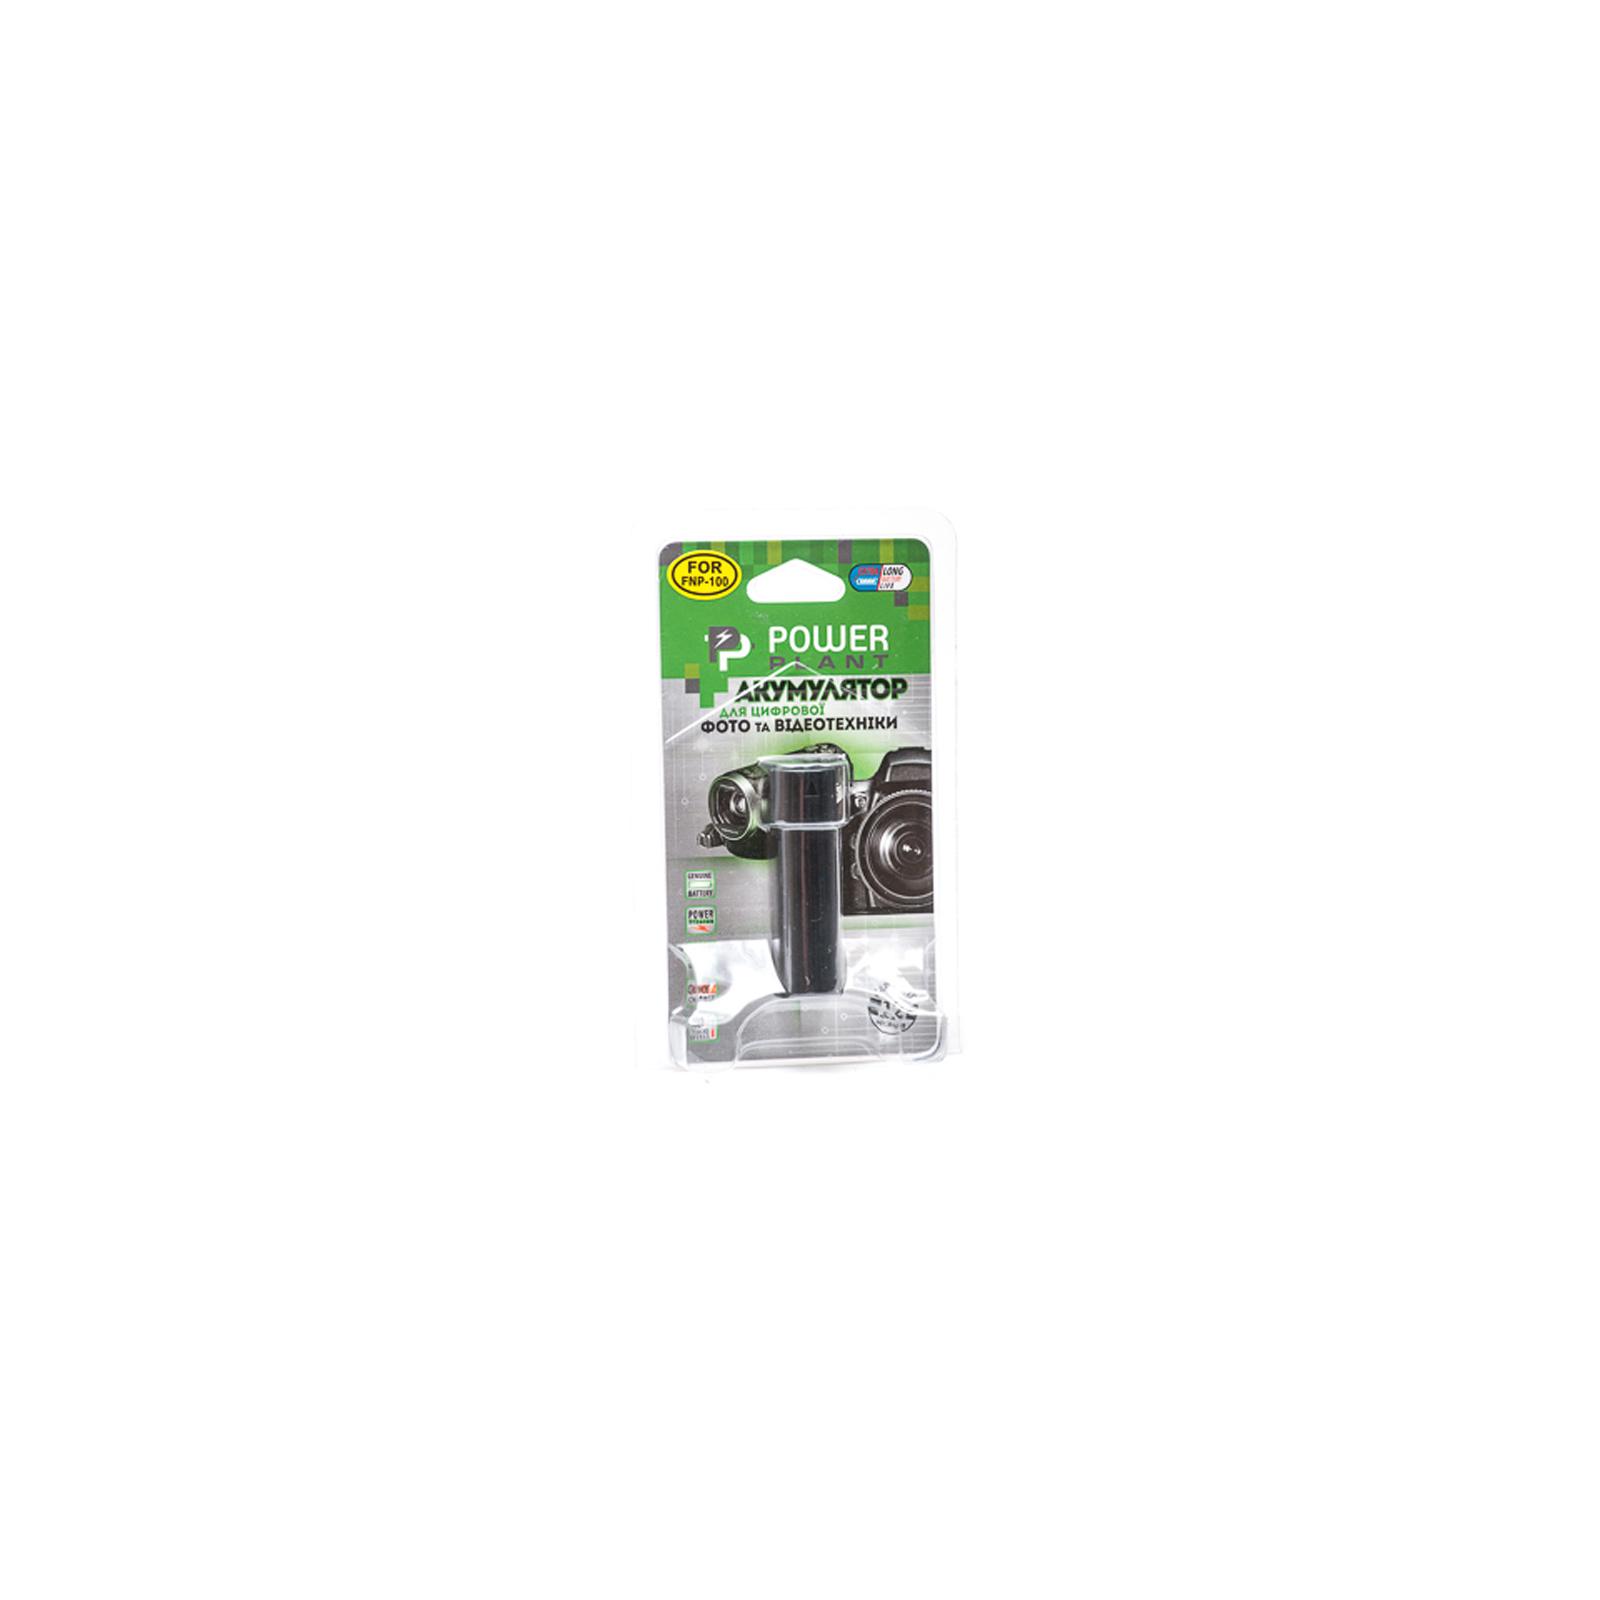 Аккумулятор к фото/видео PowerPlant Fuji NP-100 (DV00DV1049) изображение 3